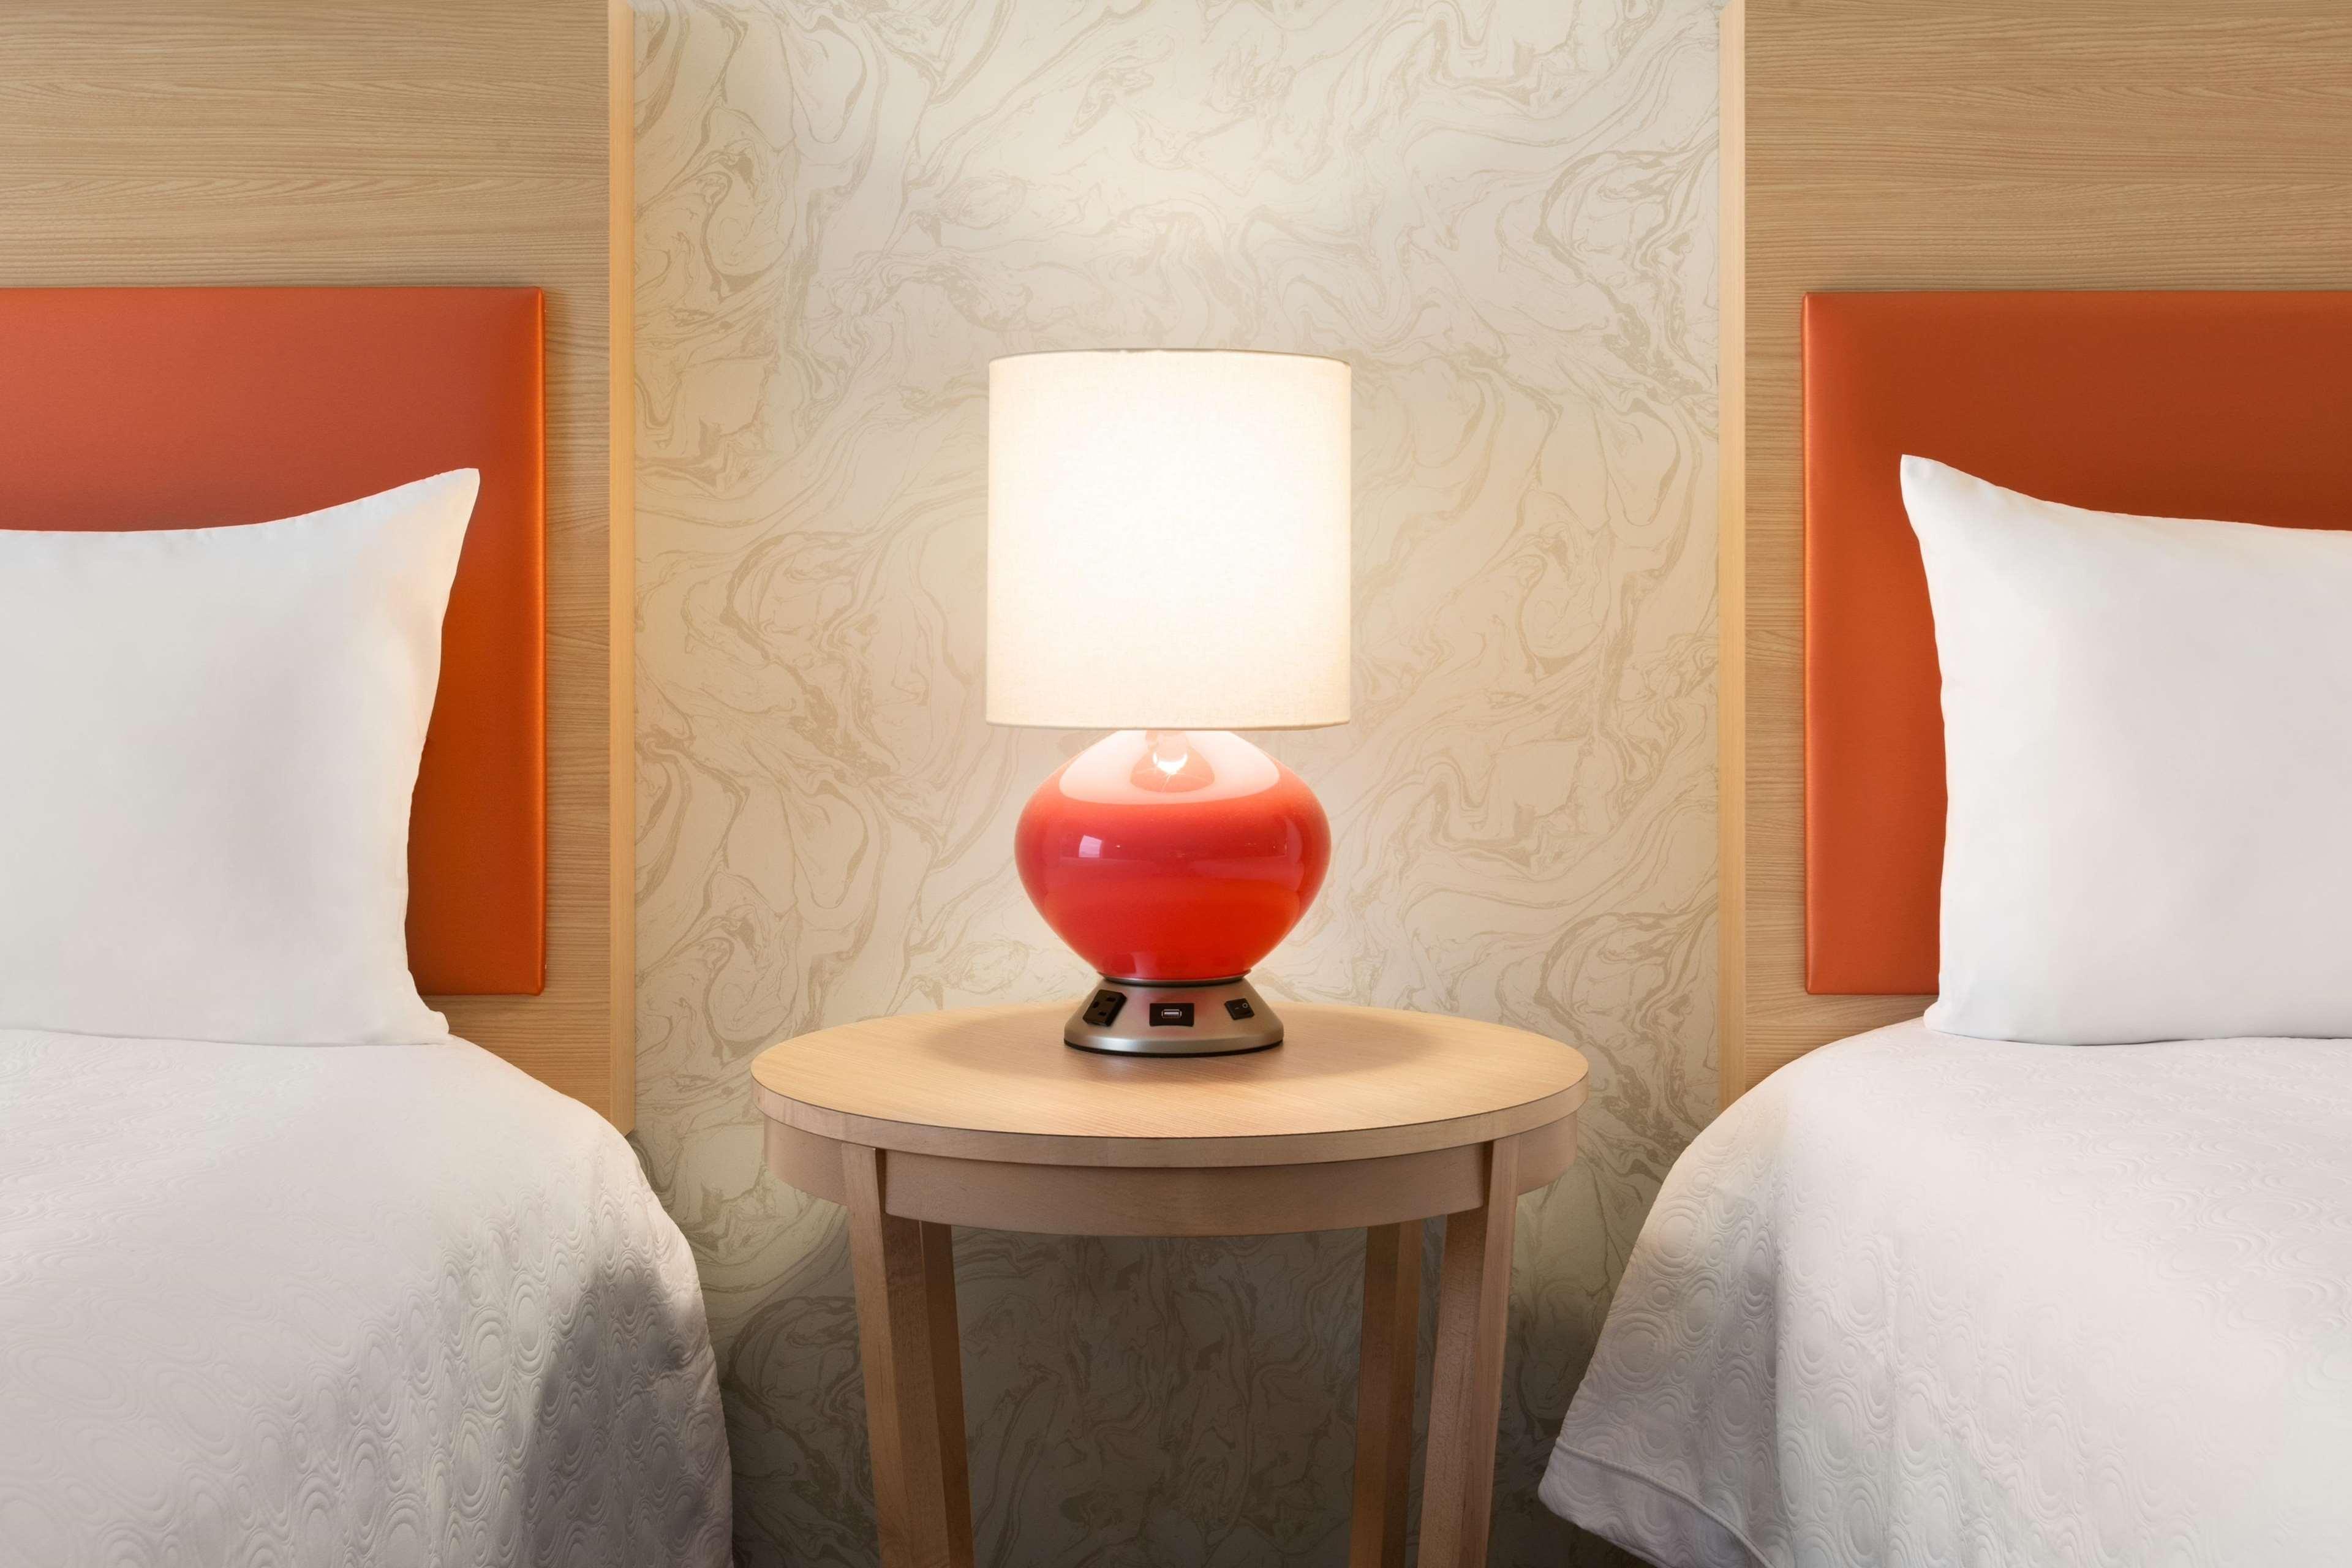 Home2 Suites by Hilton Florence Cincinnati Airport South image 30